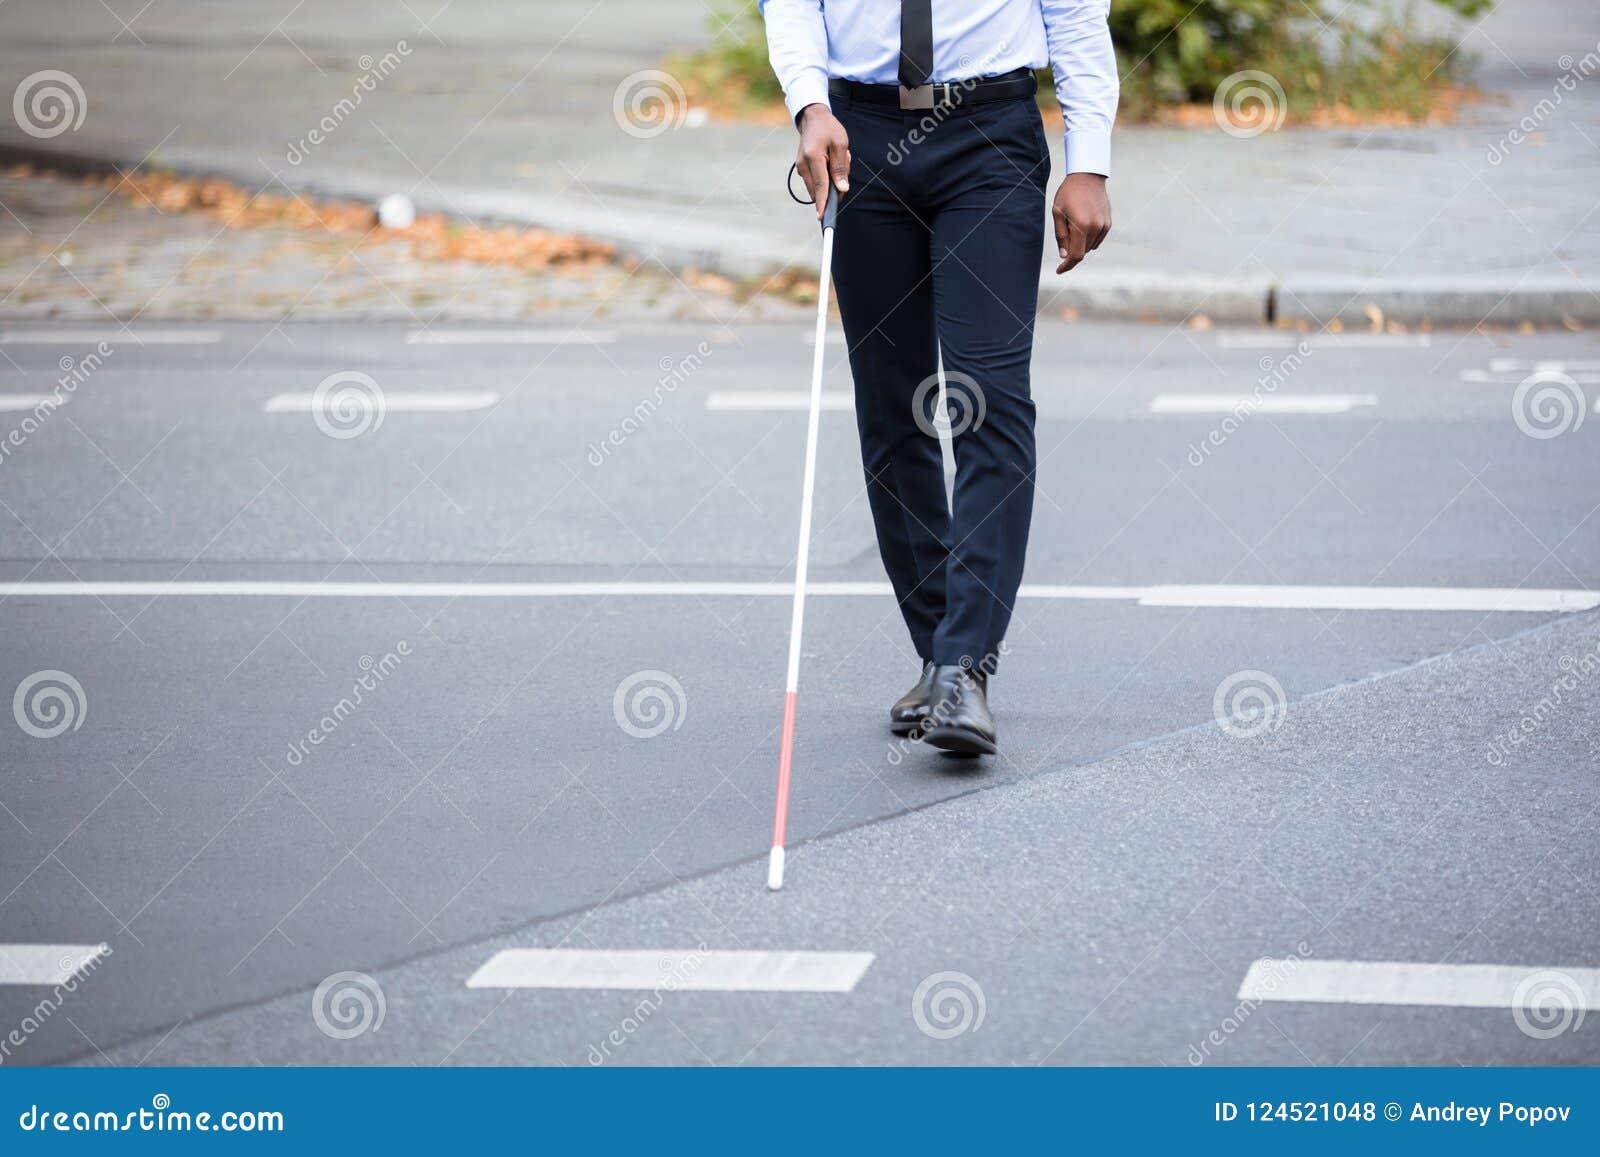 Person Walking On Street ciego